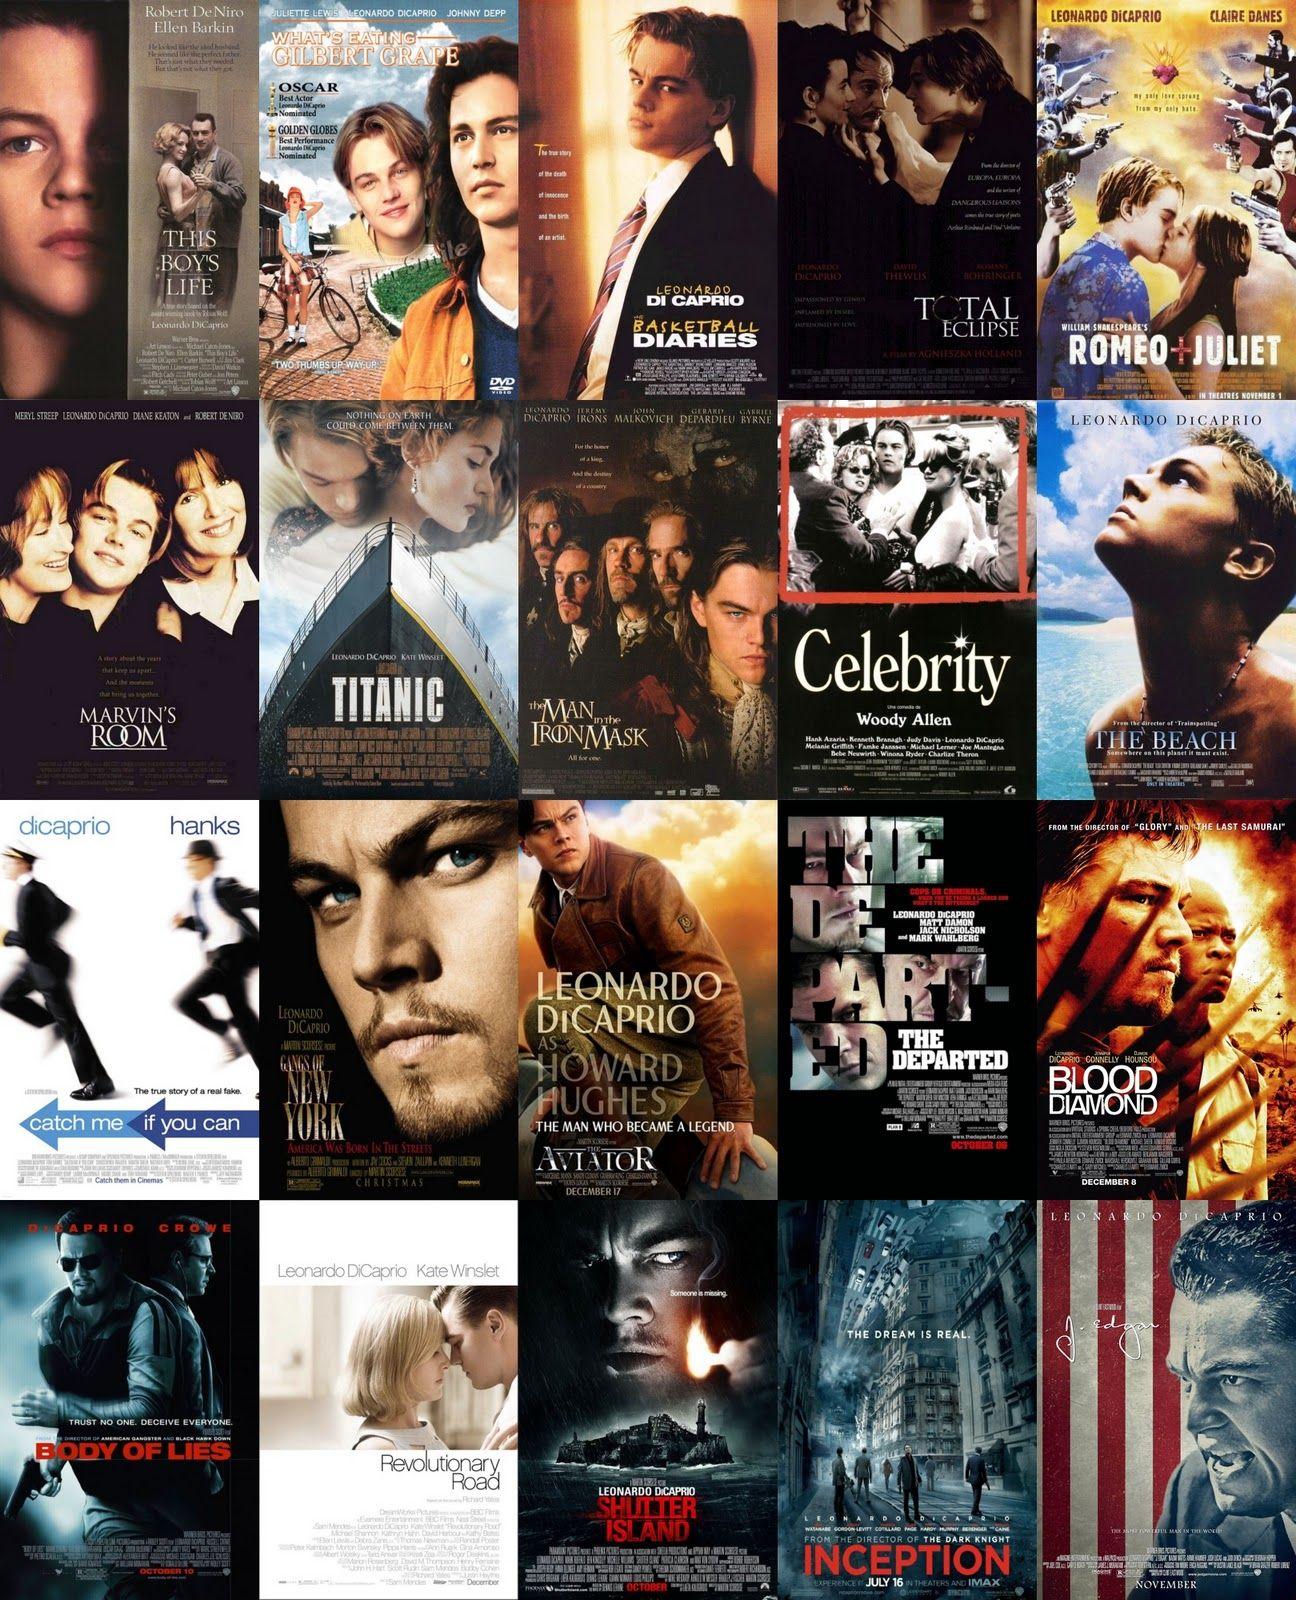 Leonardo DiCaprio will play the movie of the great Leonardo da Vinci 08/14/2017 82